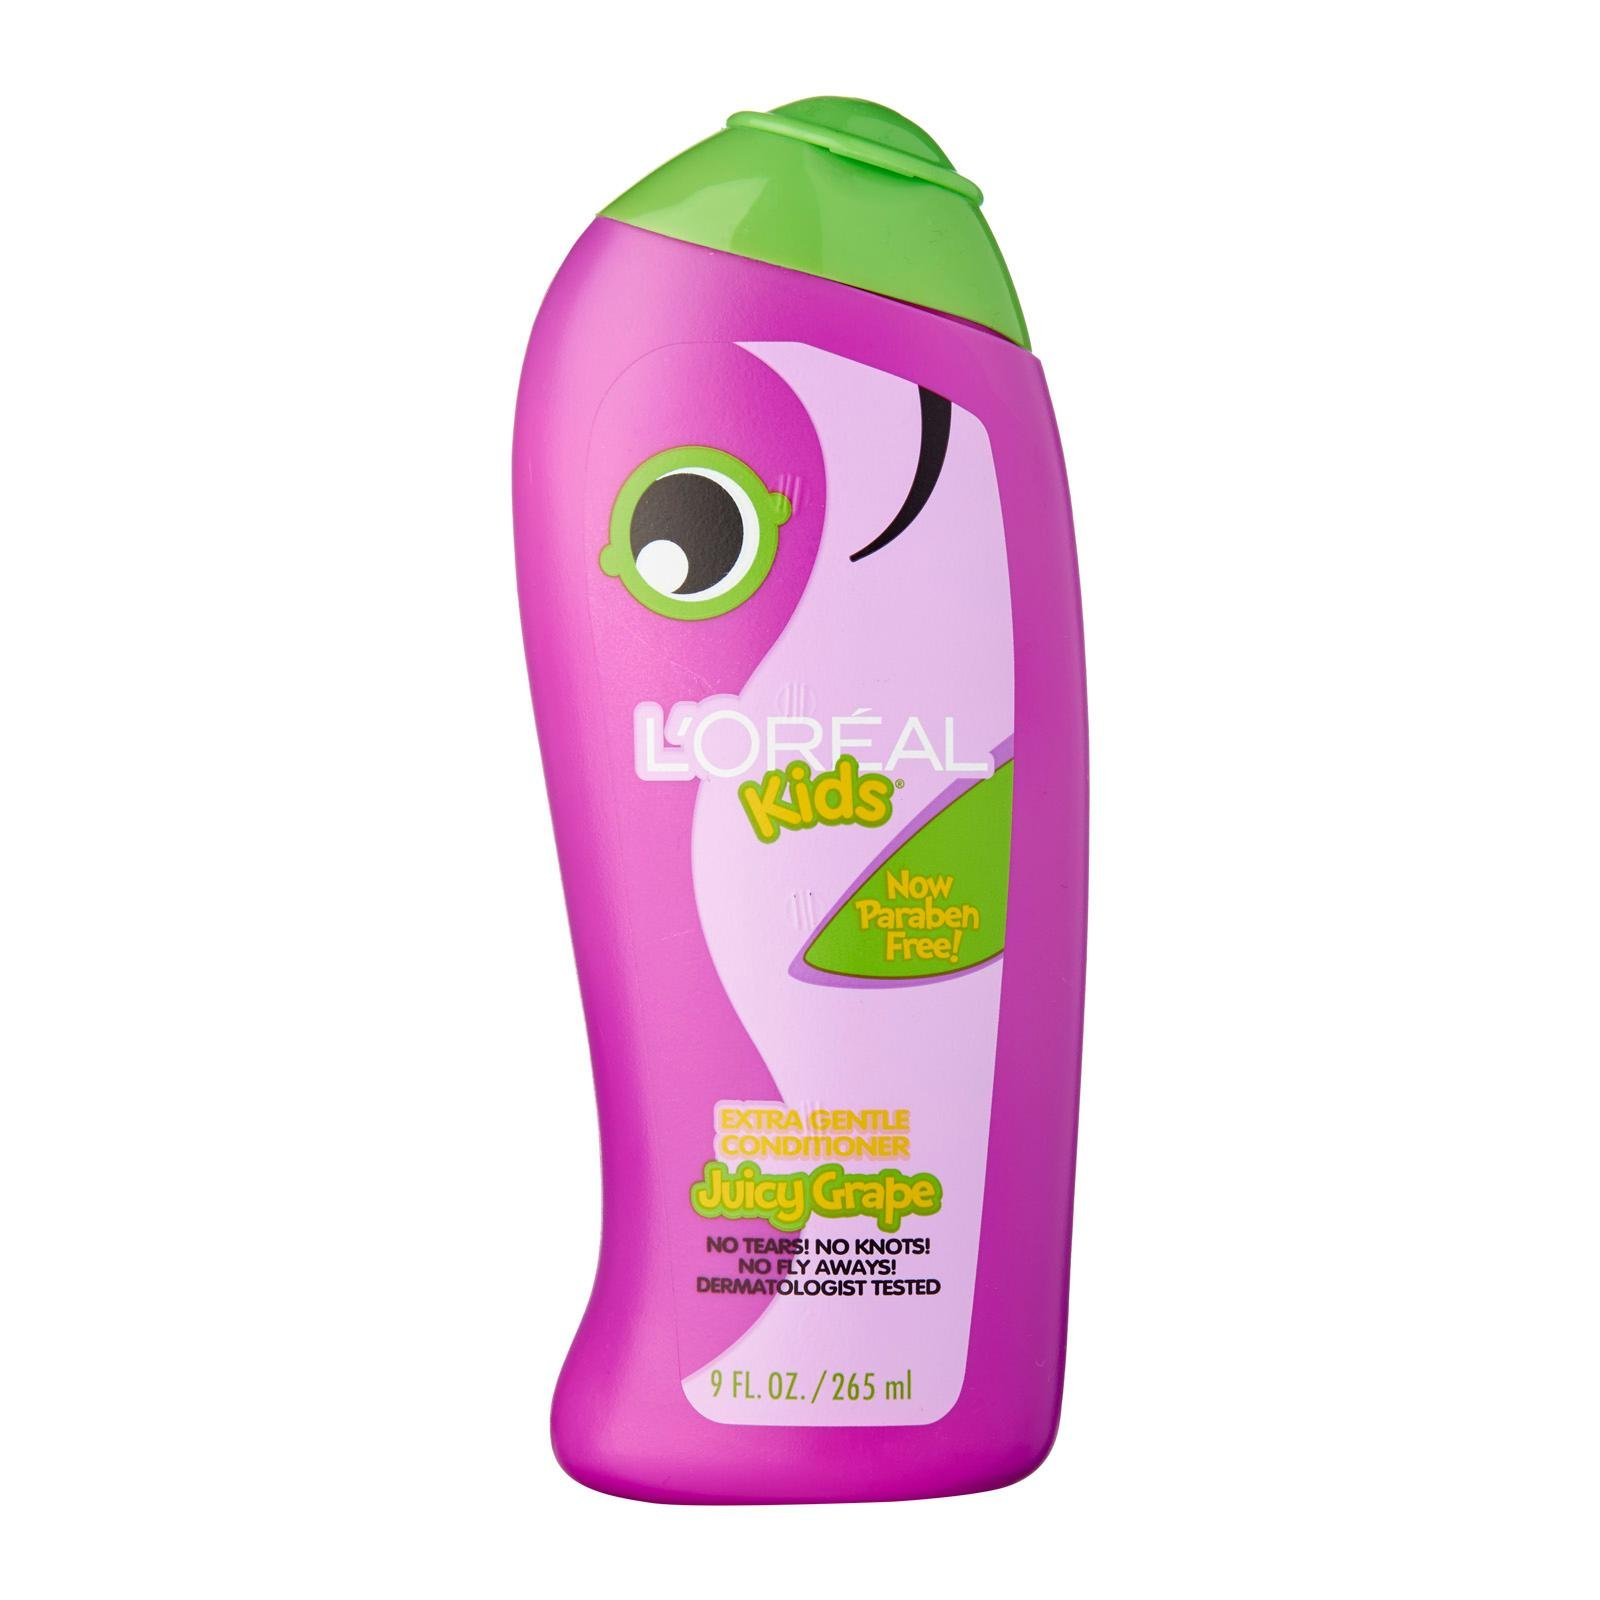 L'Oreal Kids Extra Gentle Conditioner, Grape, 9 fl oz